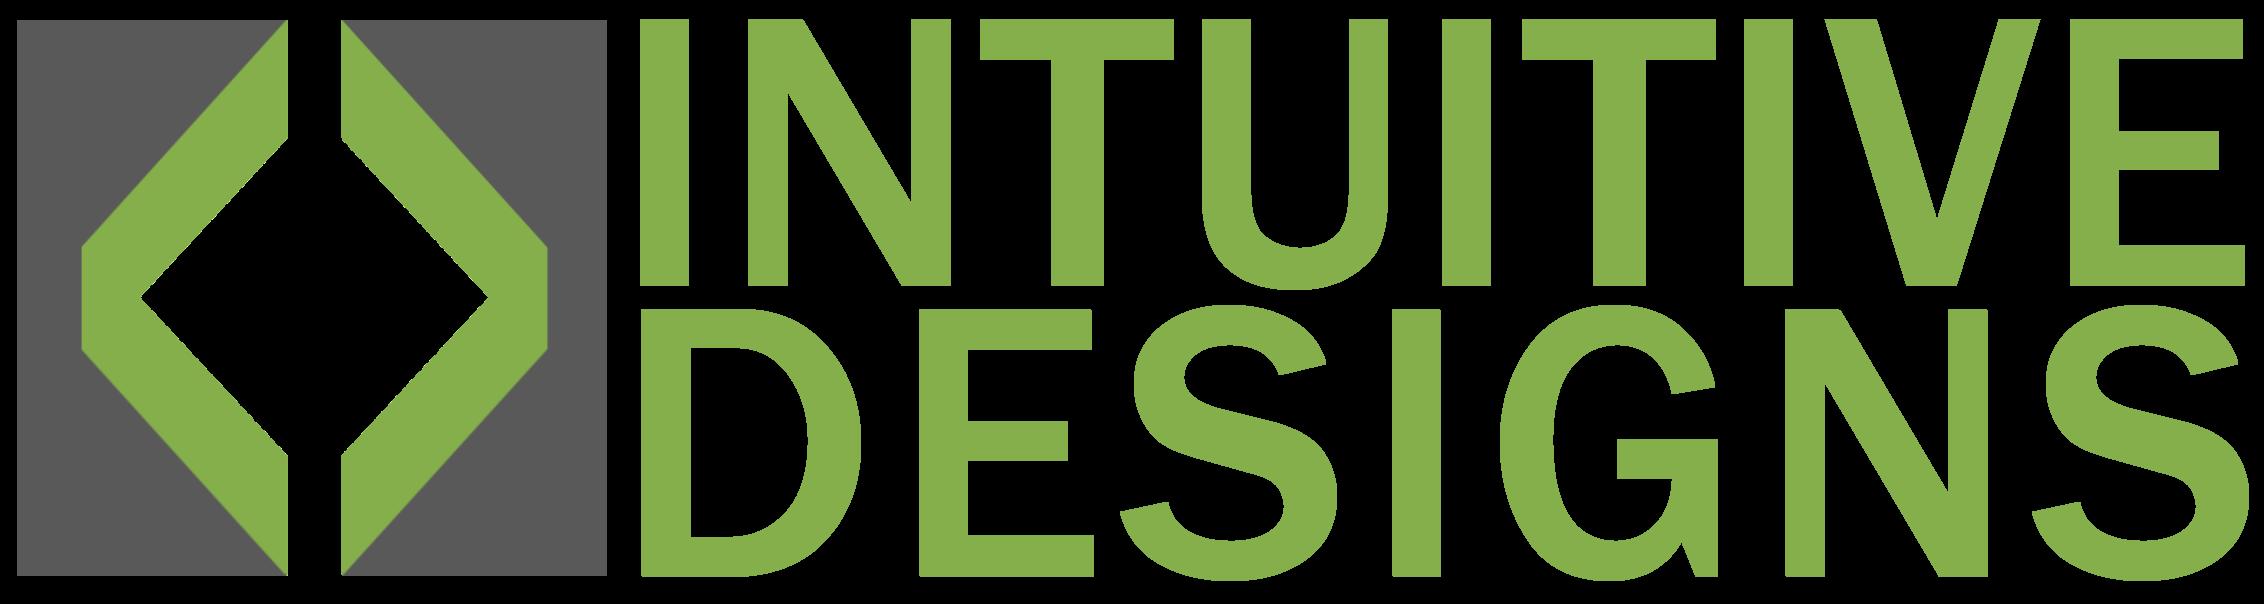 Intuitive Designs LLC